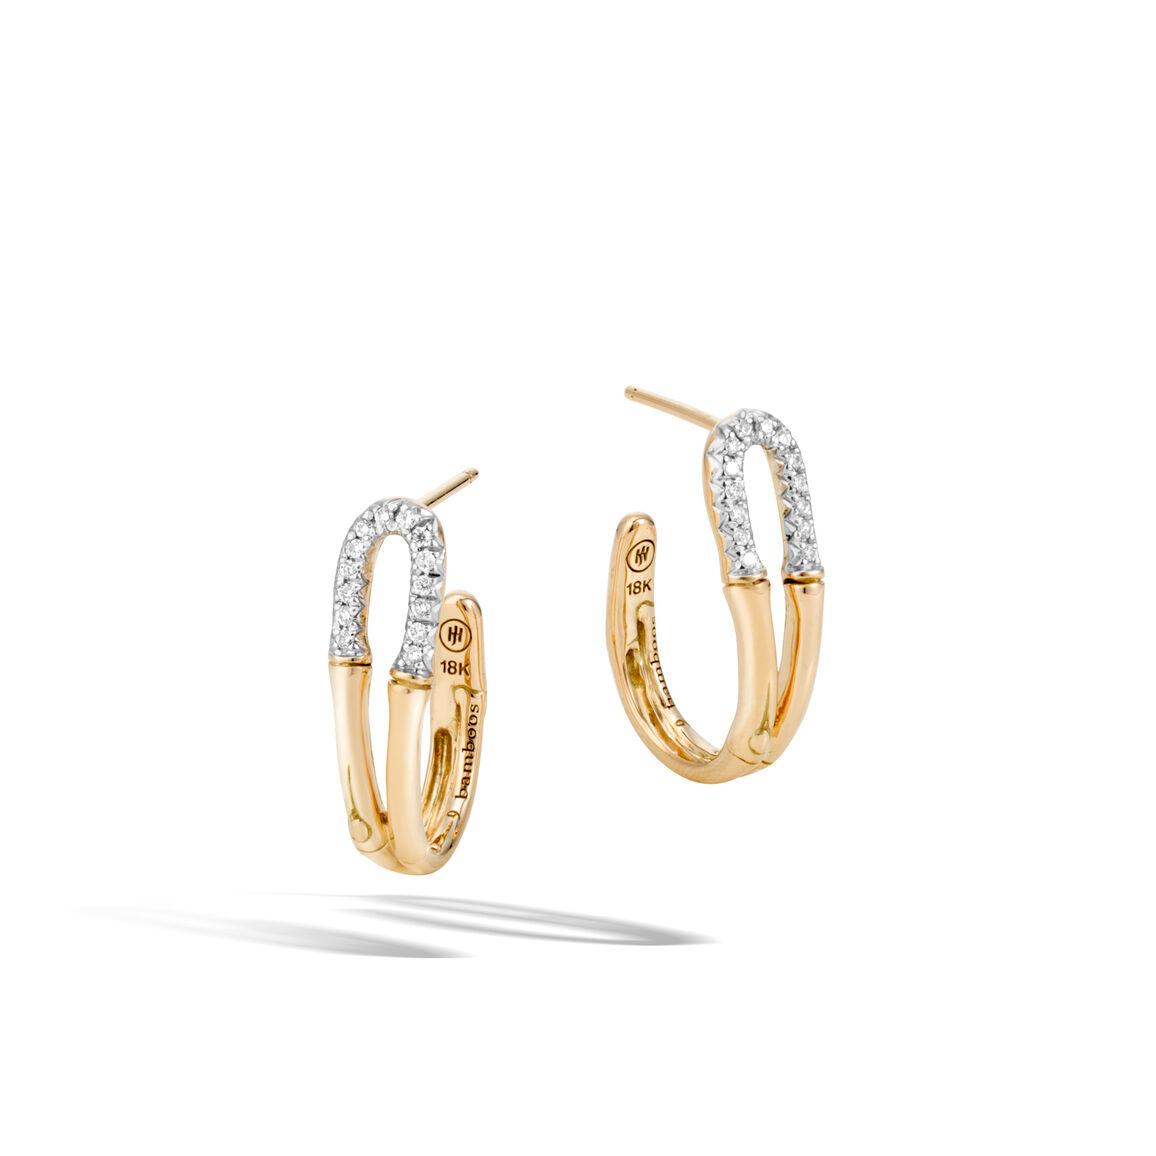 Bamboo Small Hoop Earring in 18K Goldwith Diamonds